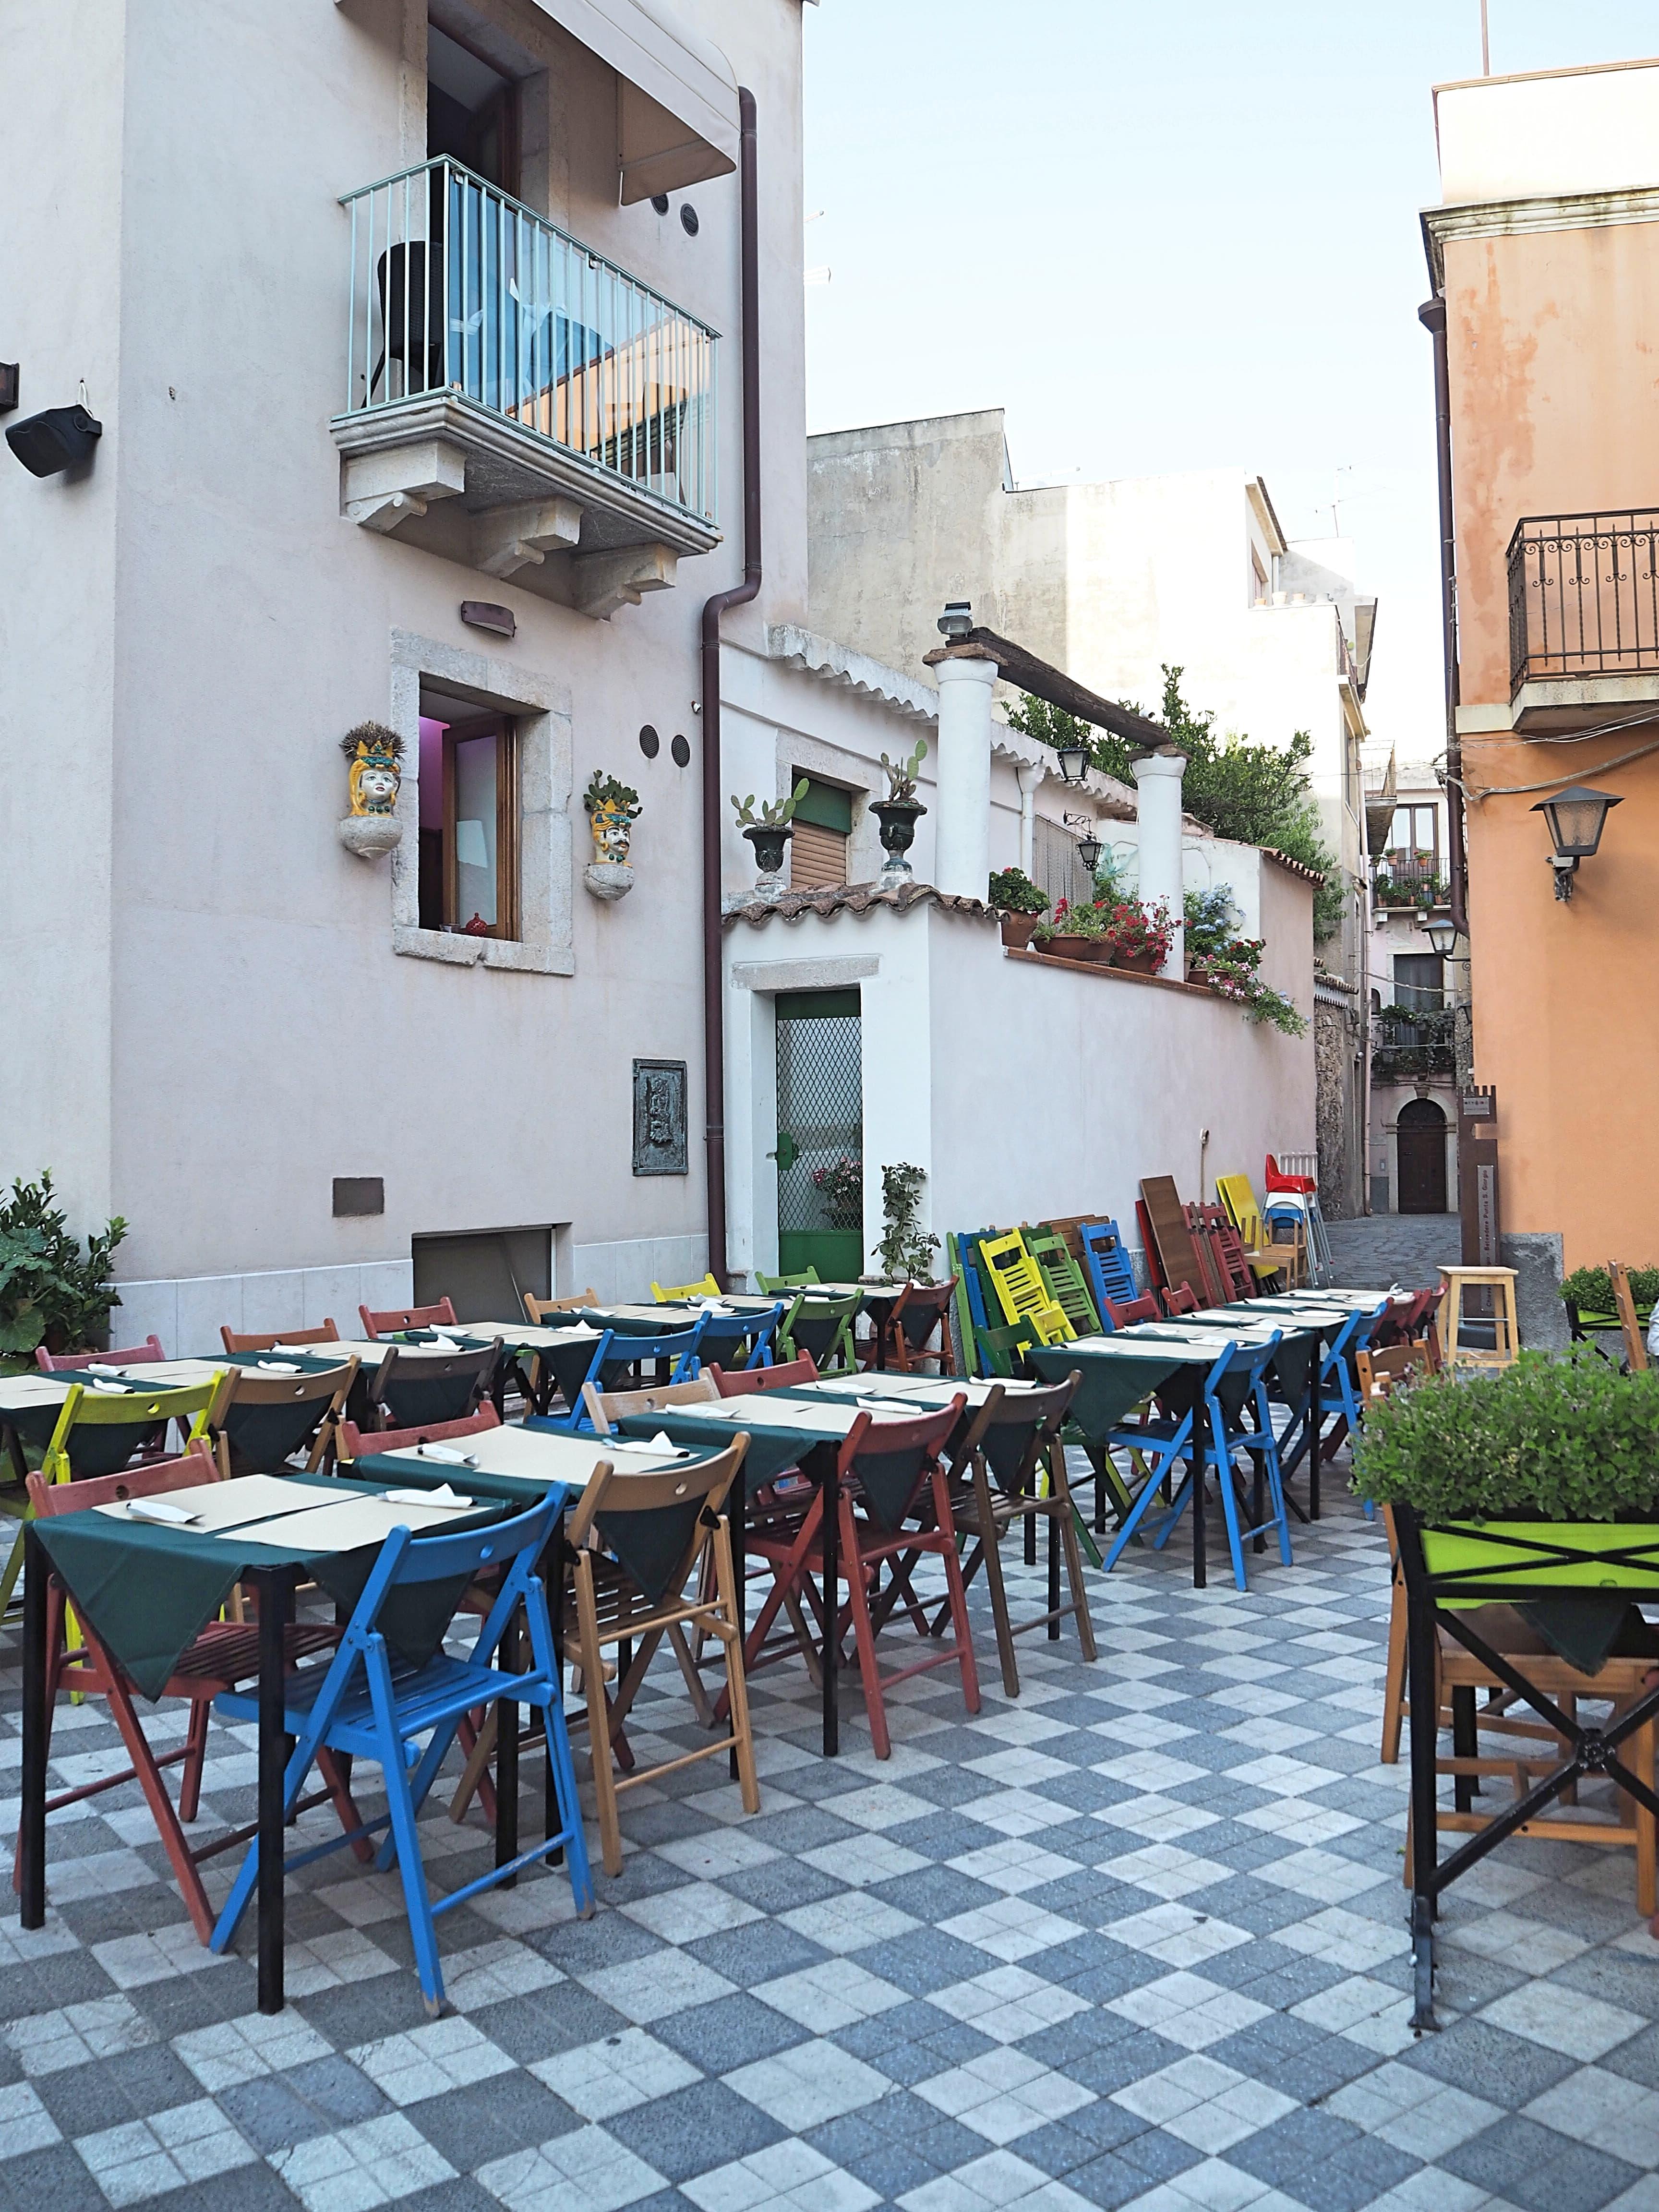 Castelmola streets